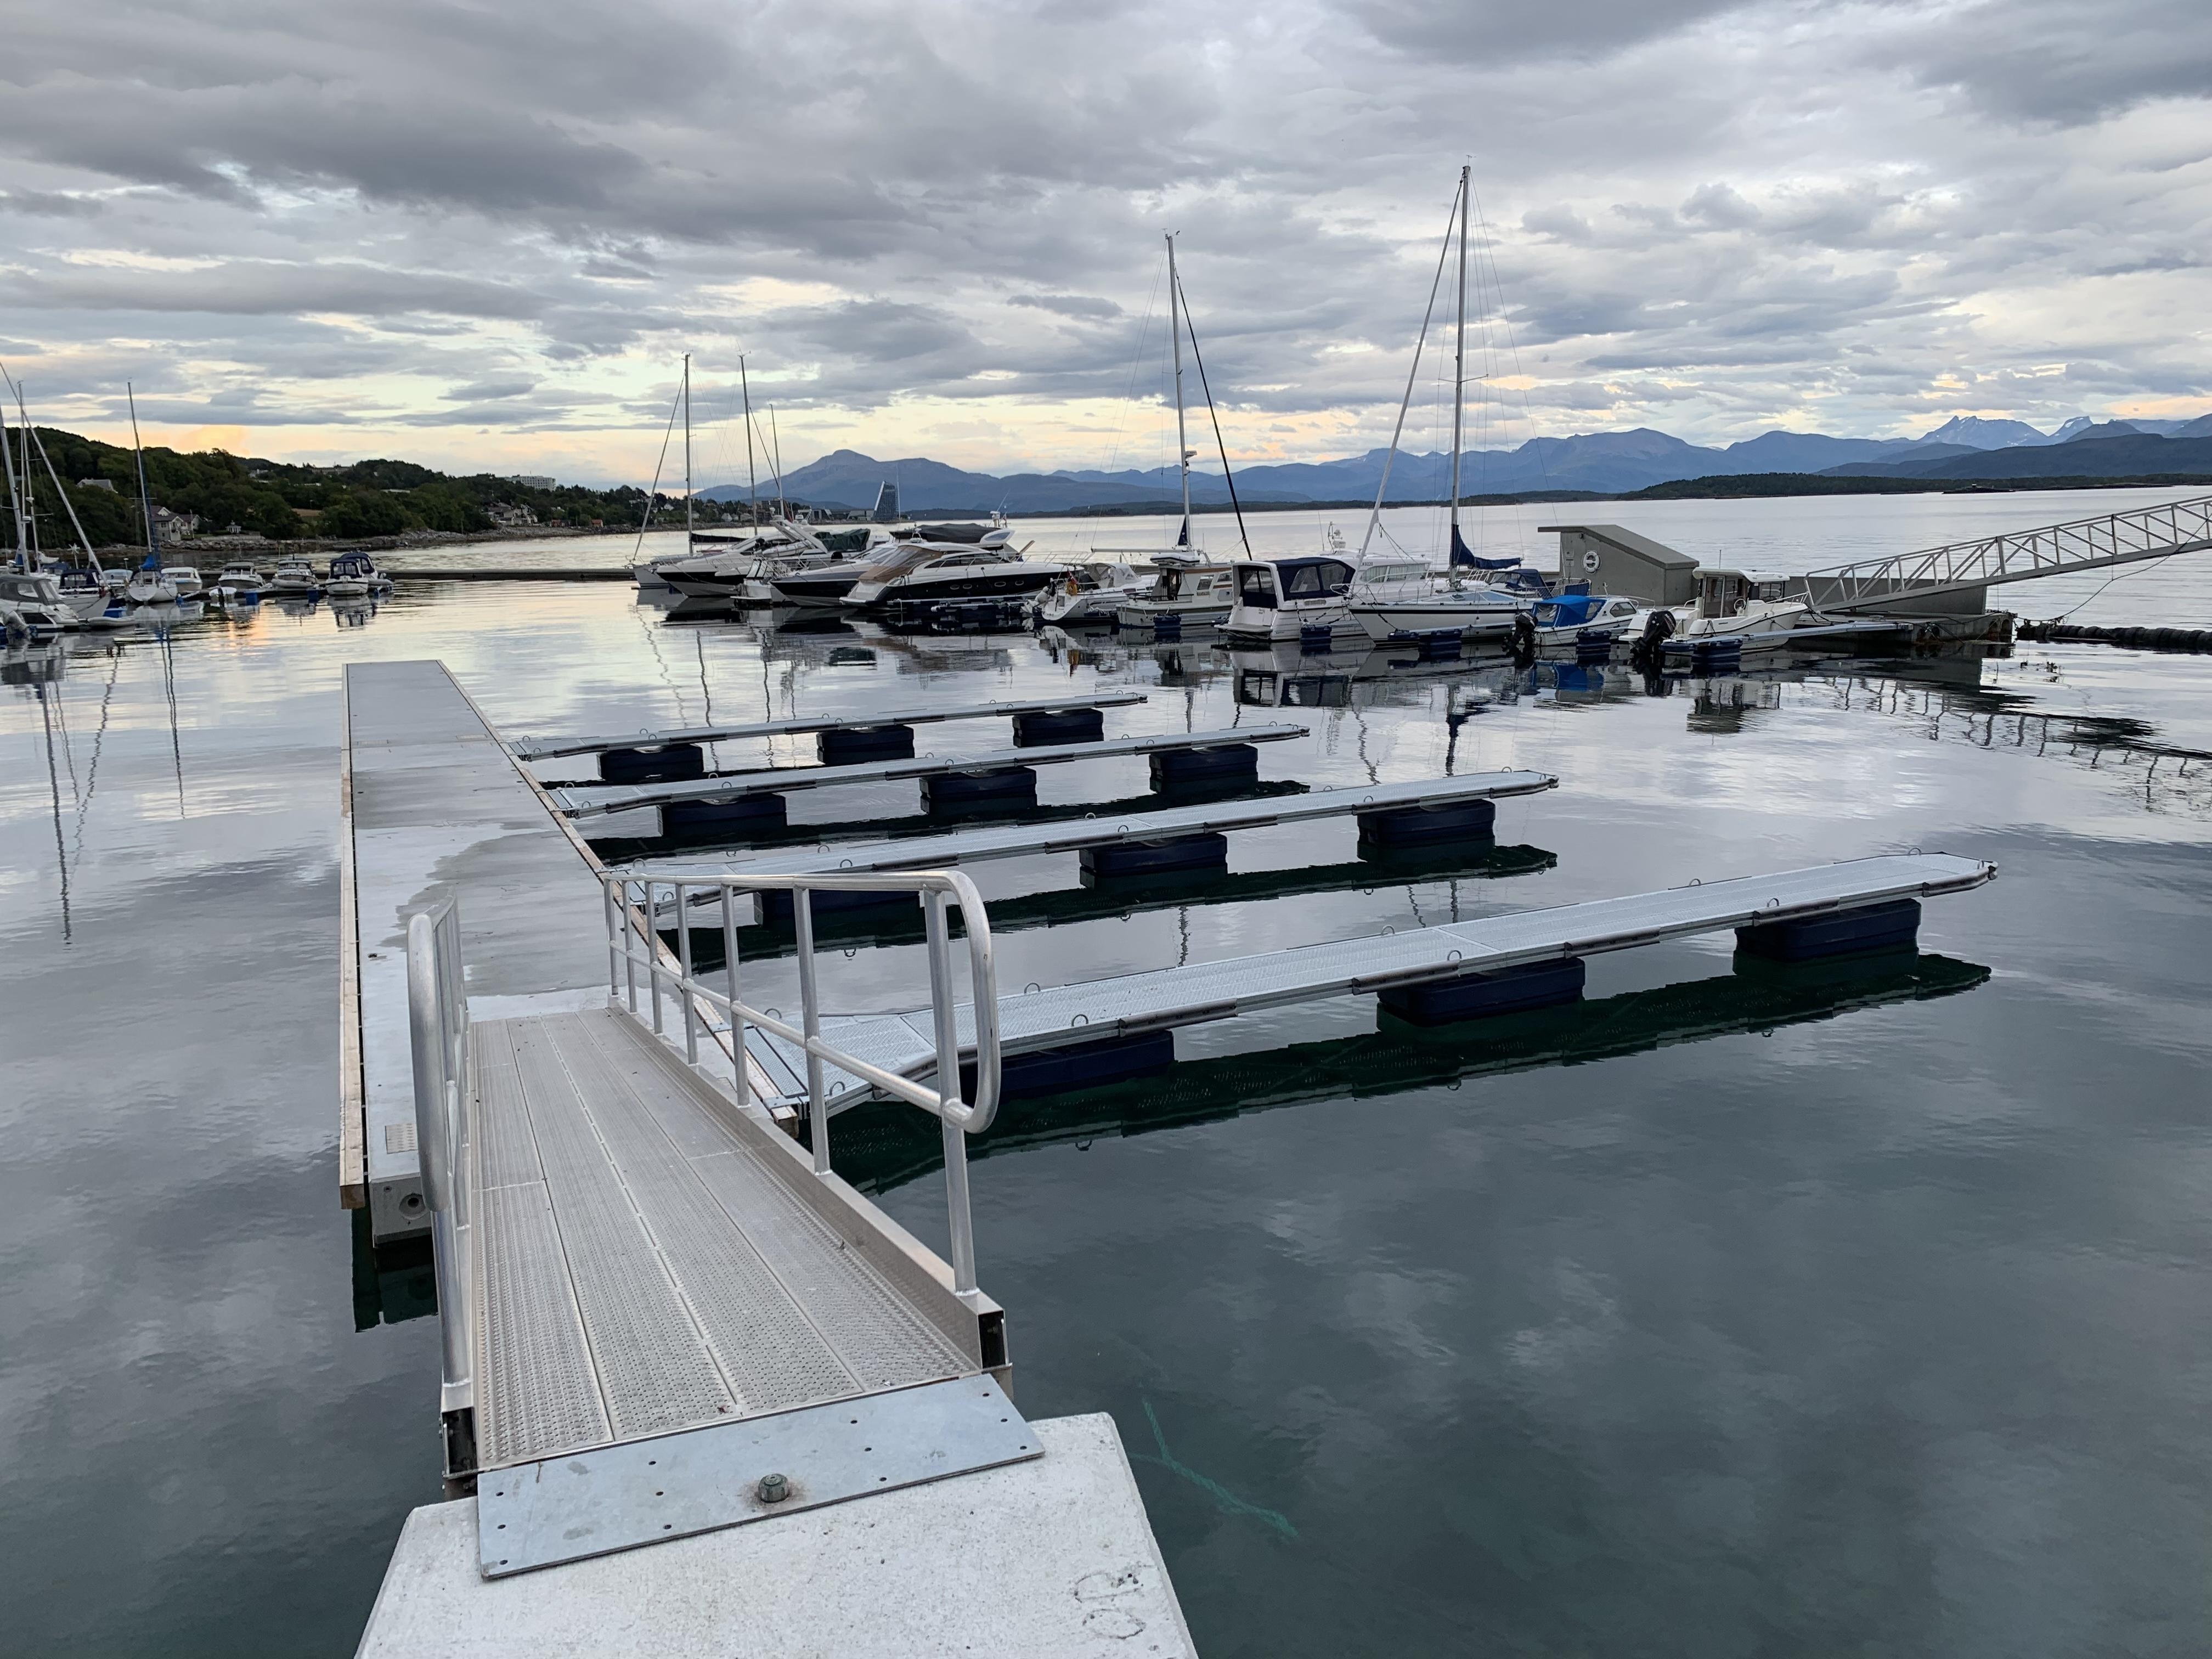 https://www.marinasolutions.no/uploads/Cap-Clara-Småbåtshavn-oppgradering-bryggepir-betongbrygge_-heavy-duty-utriggere-7.jpg